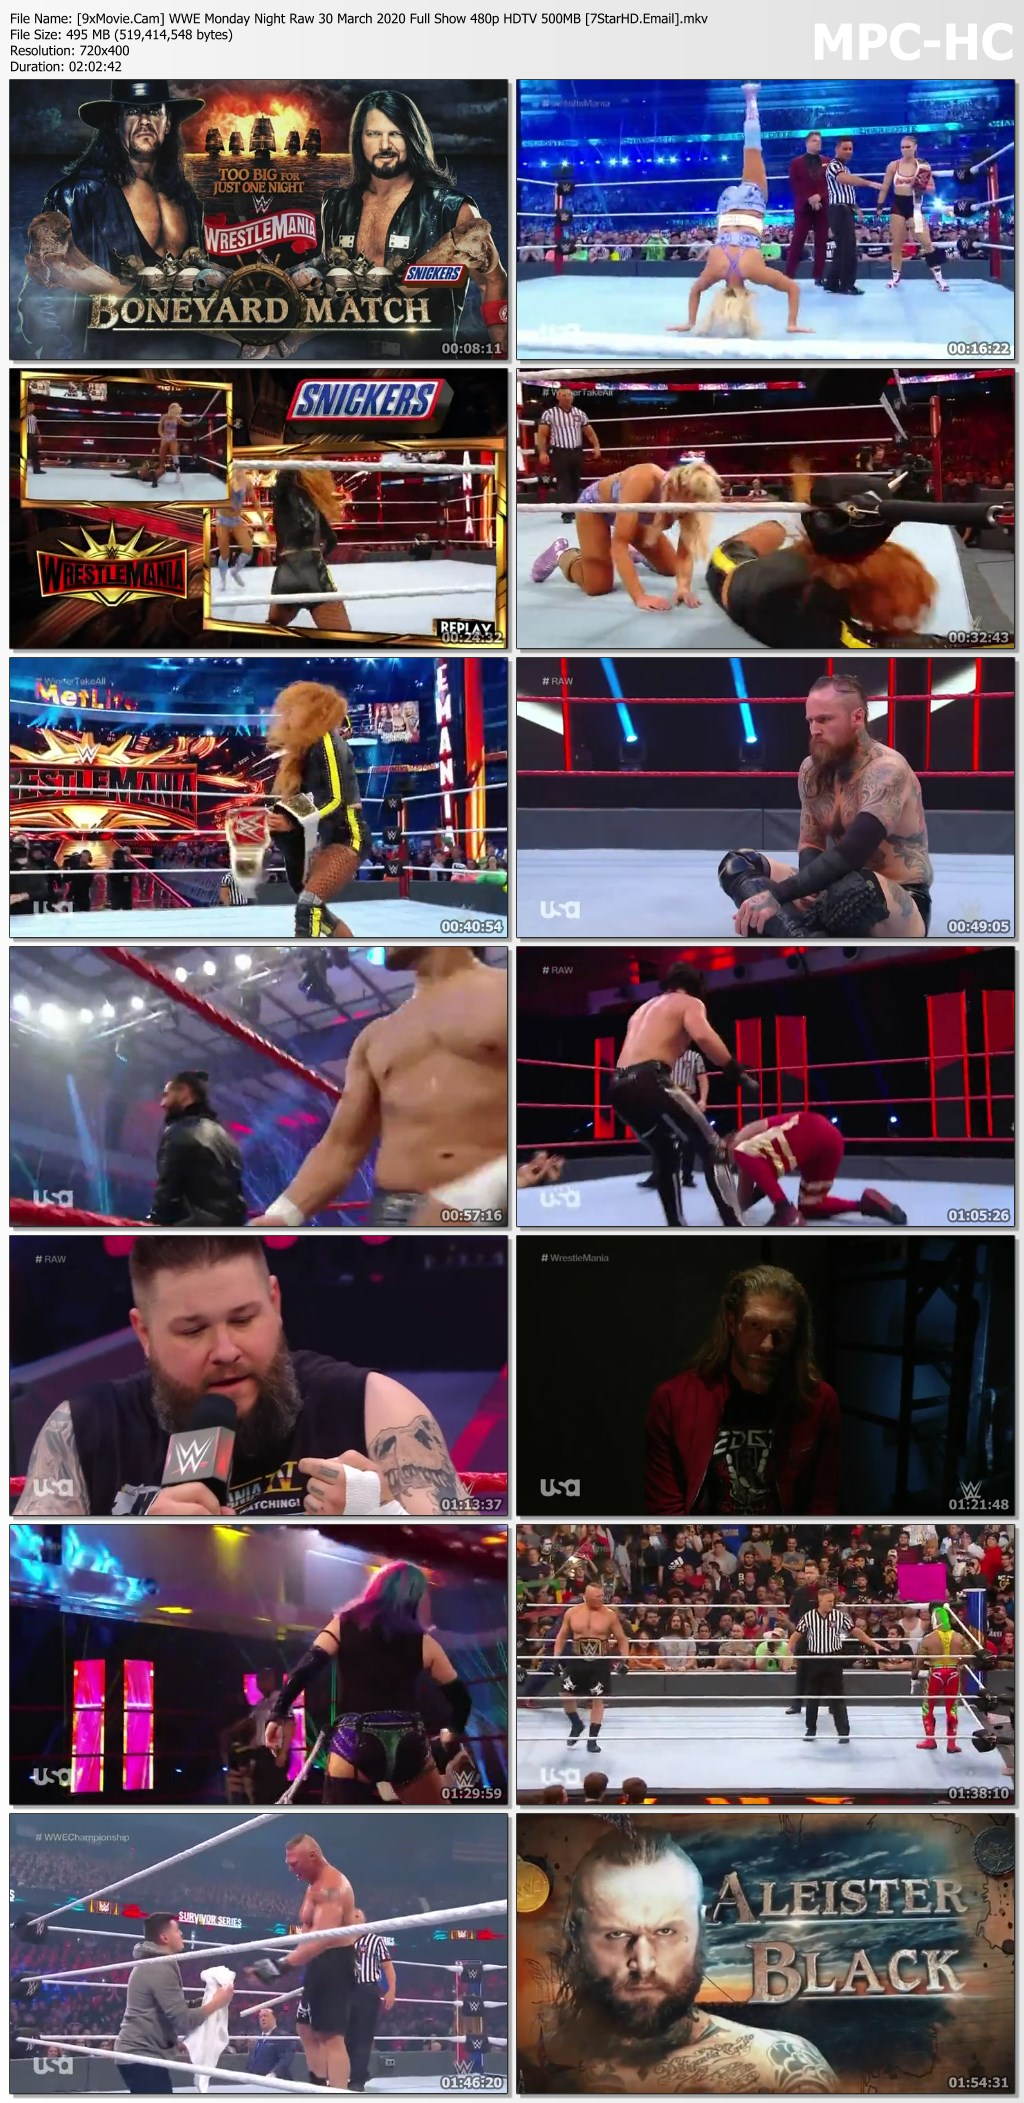 WWE Monday Night Raw 30 March 2020 Full Show 480p HDTV x264 500MB